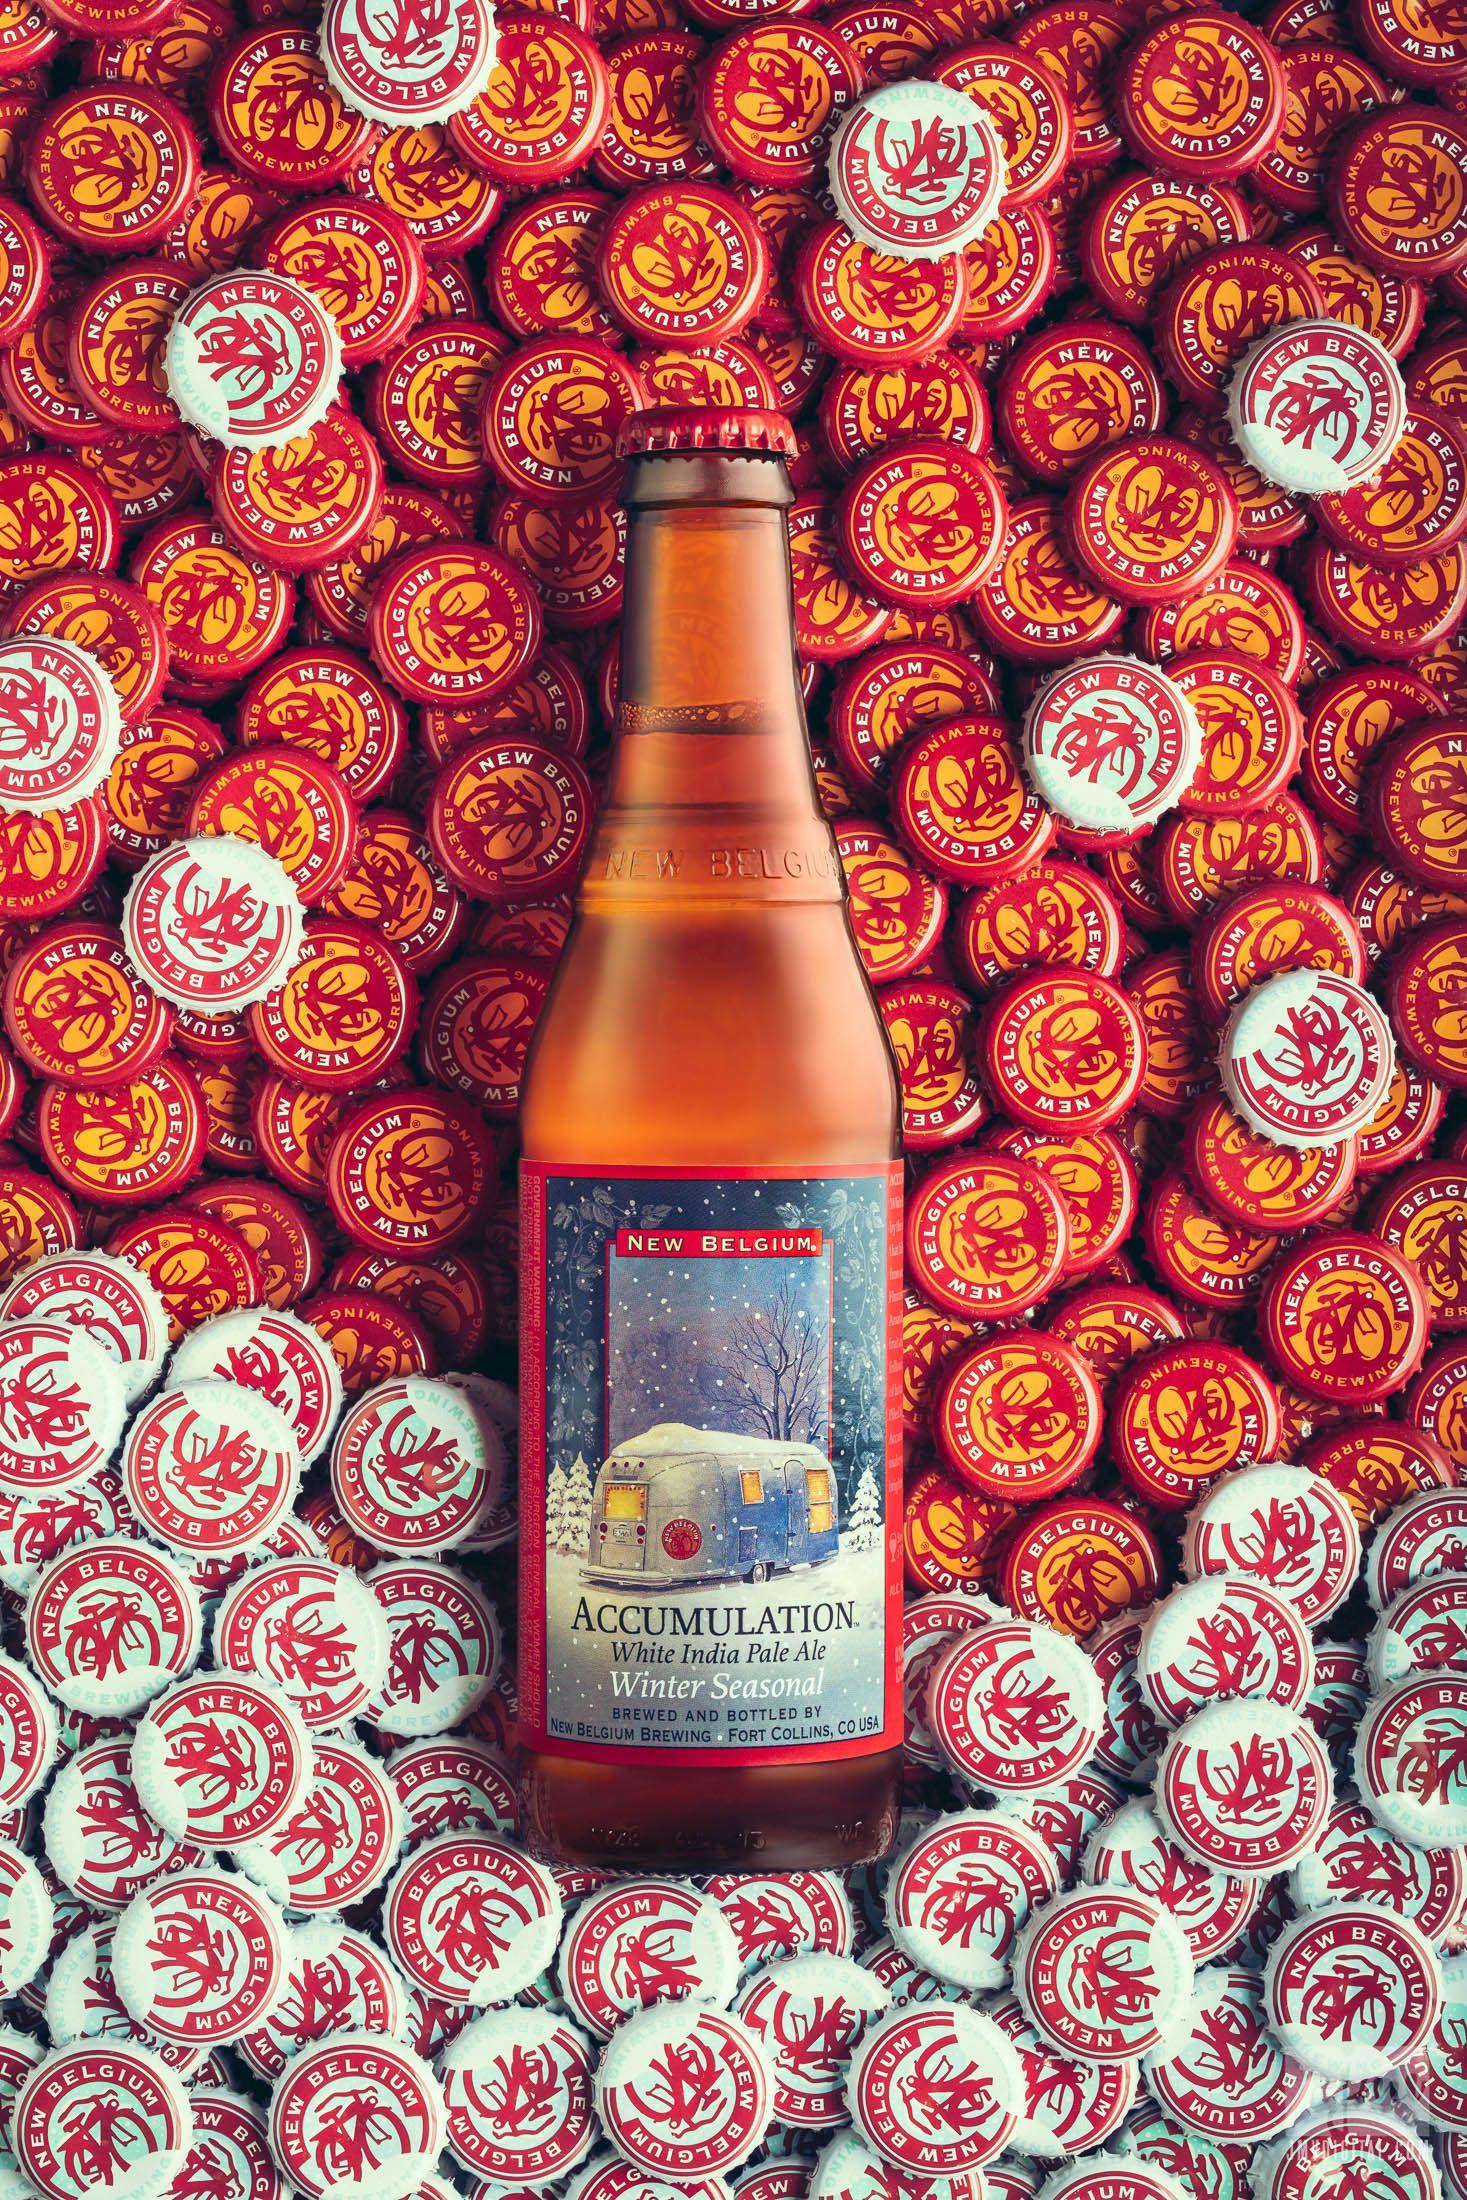 Jmvdigital Commercial Photography New Belgium Accumulation Alcool Biere Artisanale Verre A Biere